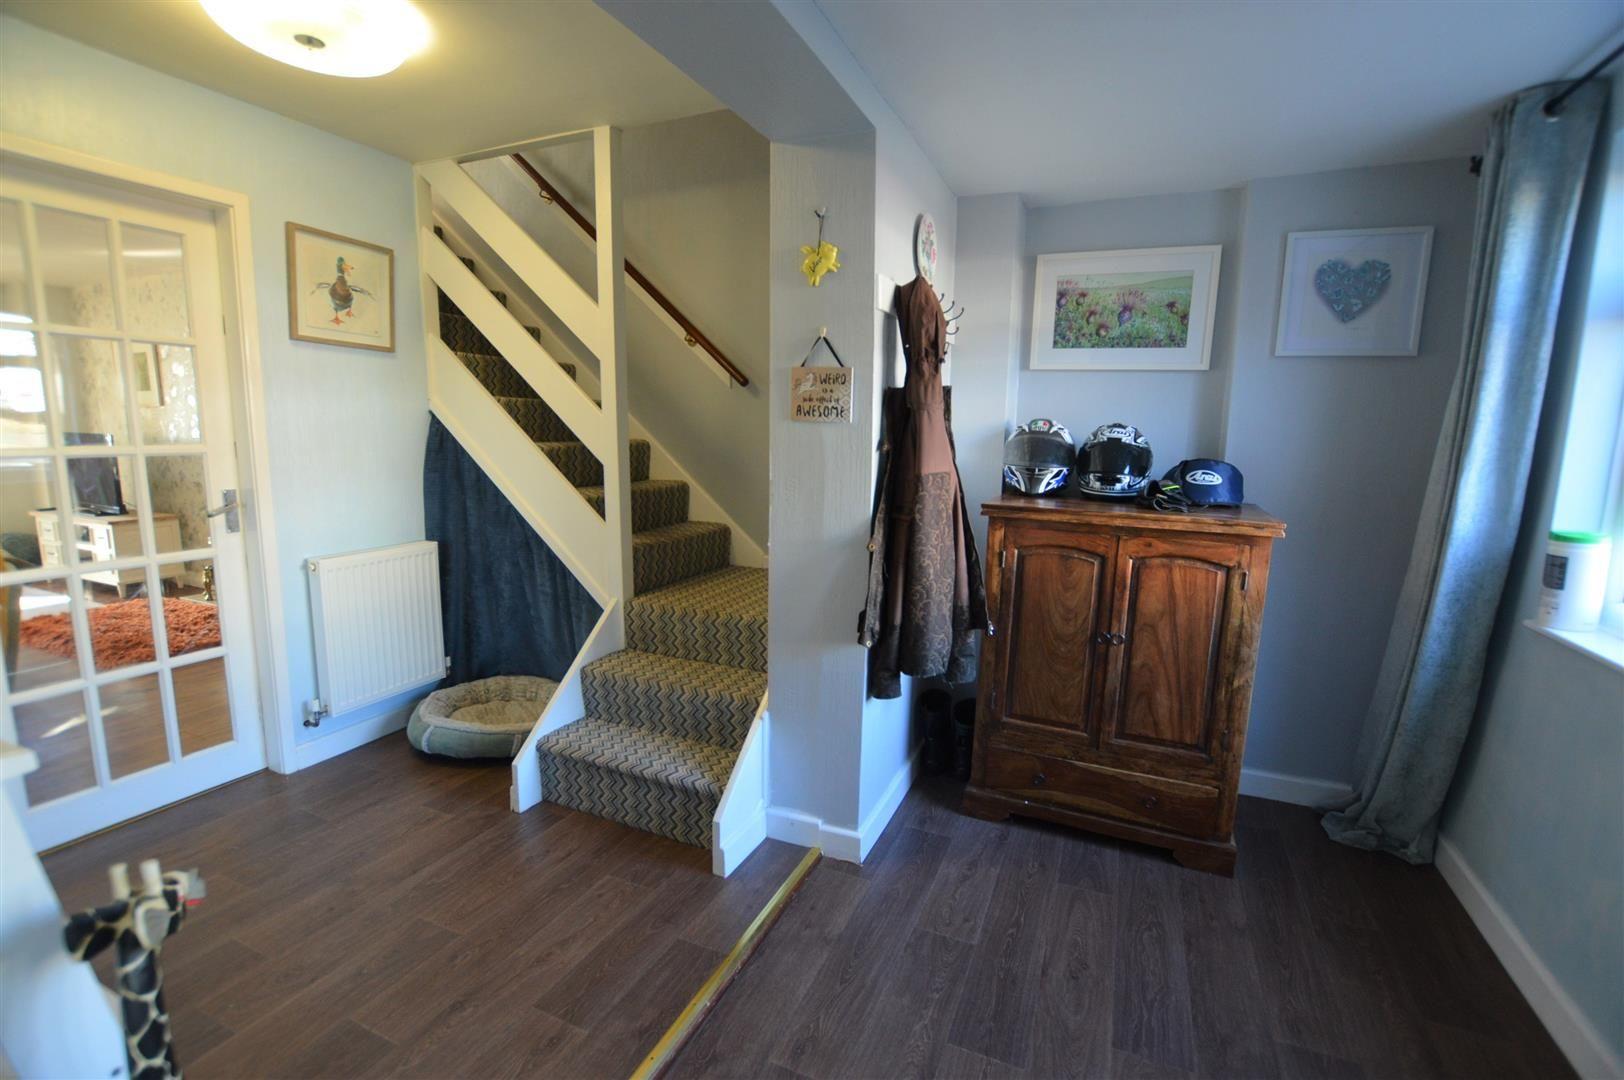 4 bed semi-detached for sale in Bromyard  - Property Image 5